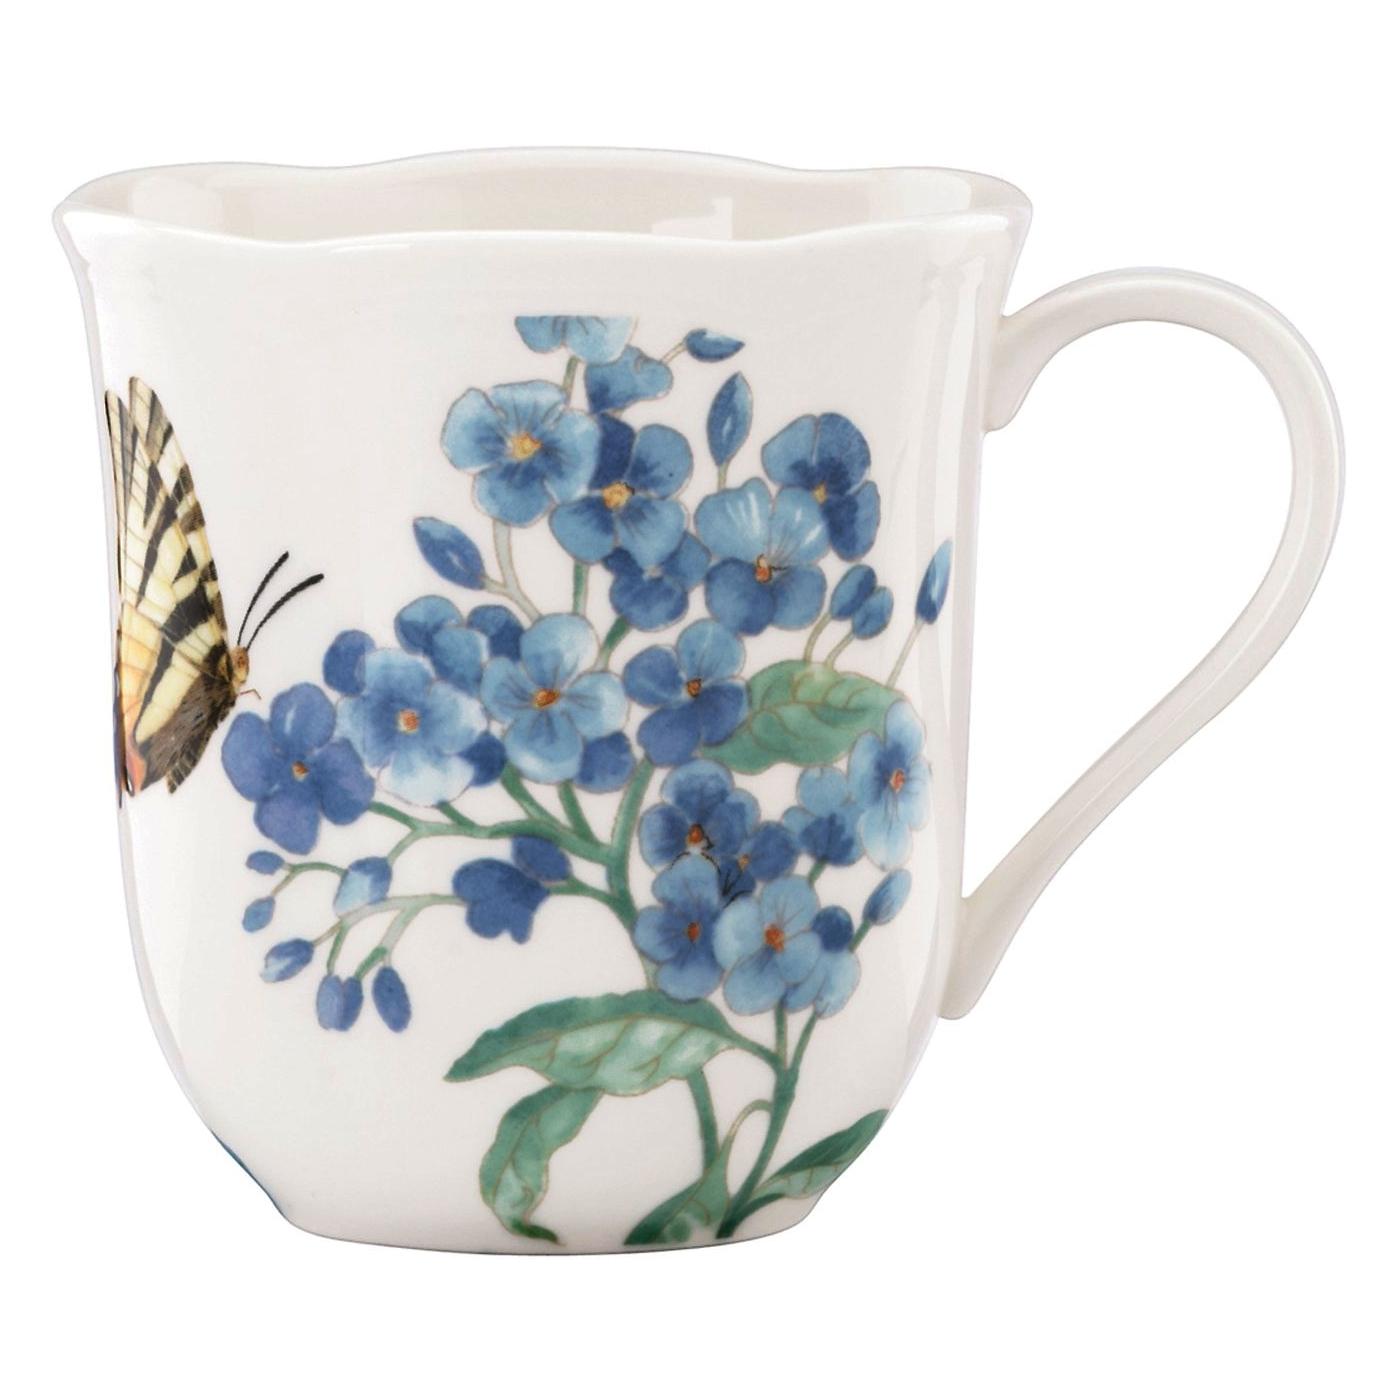 Lenox Butterfly Meadow Blue 10 Ounce Mug, Set of 4